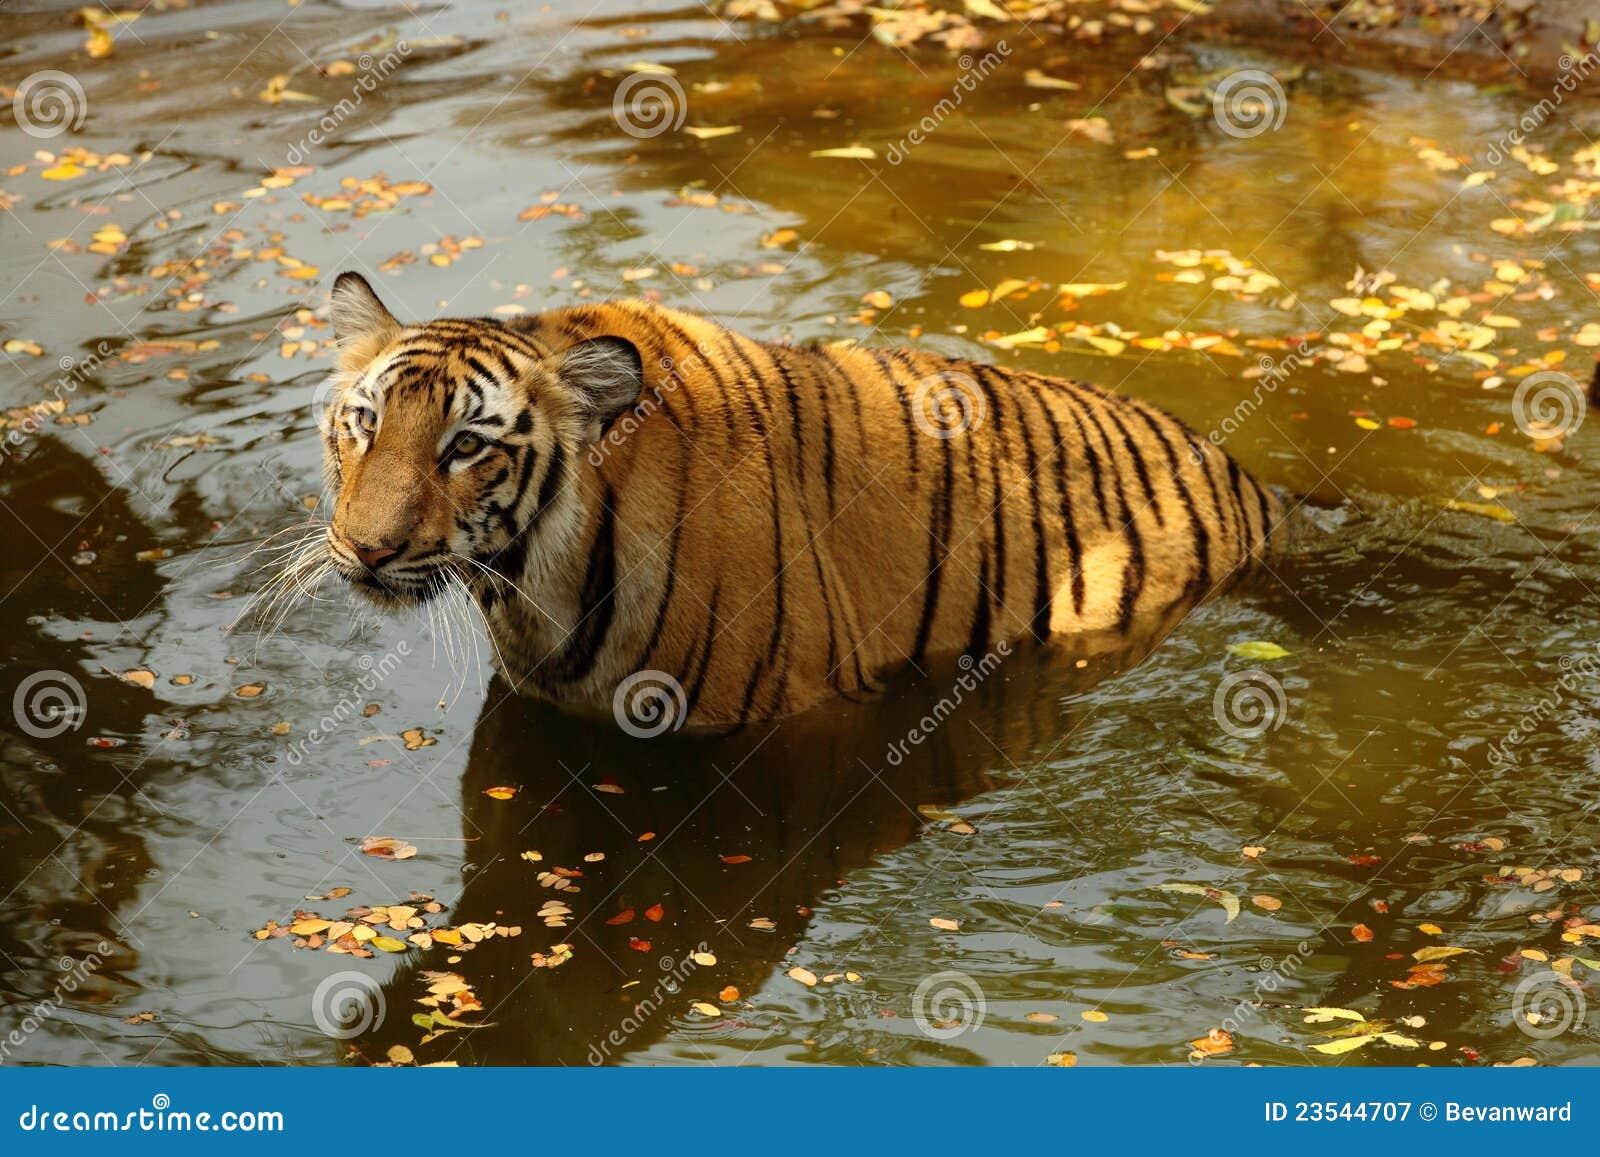 Tigre de Bengala real en agua